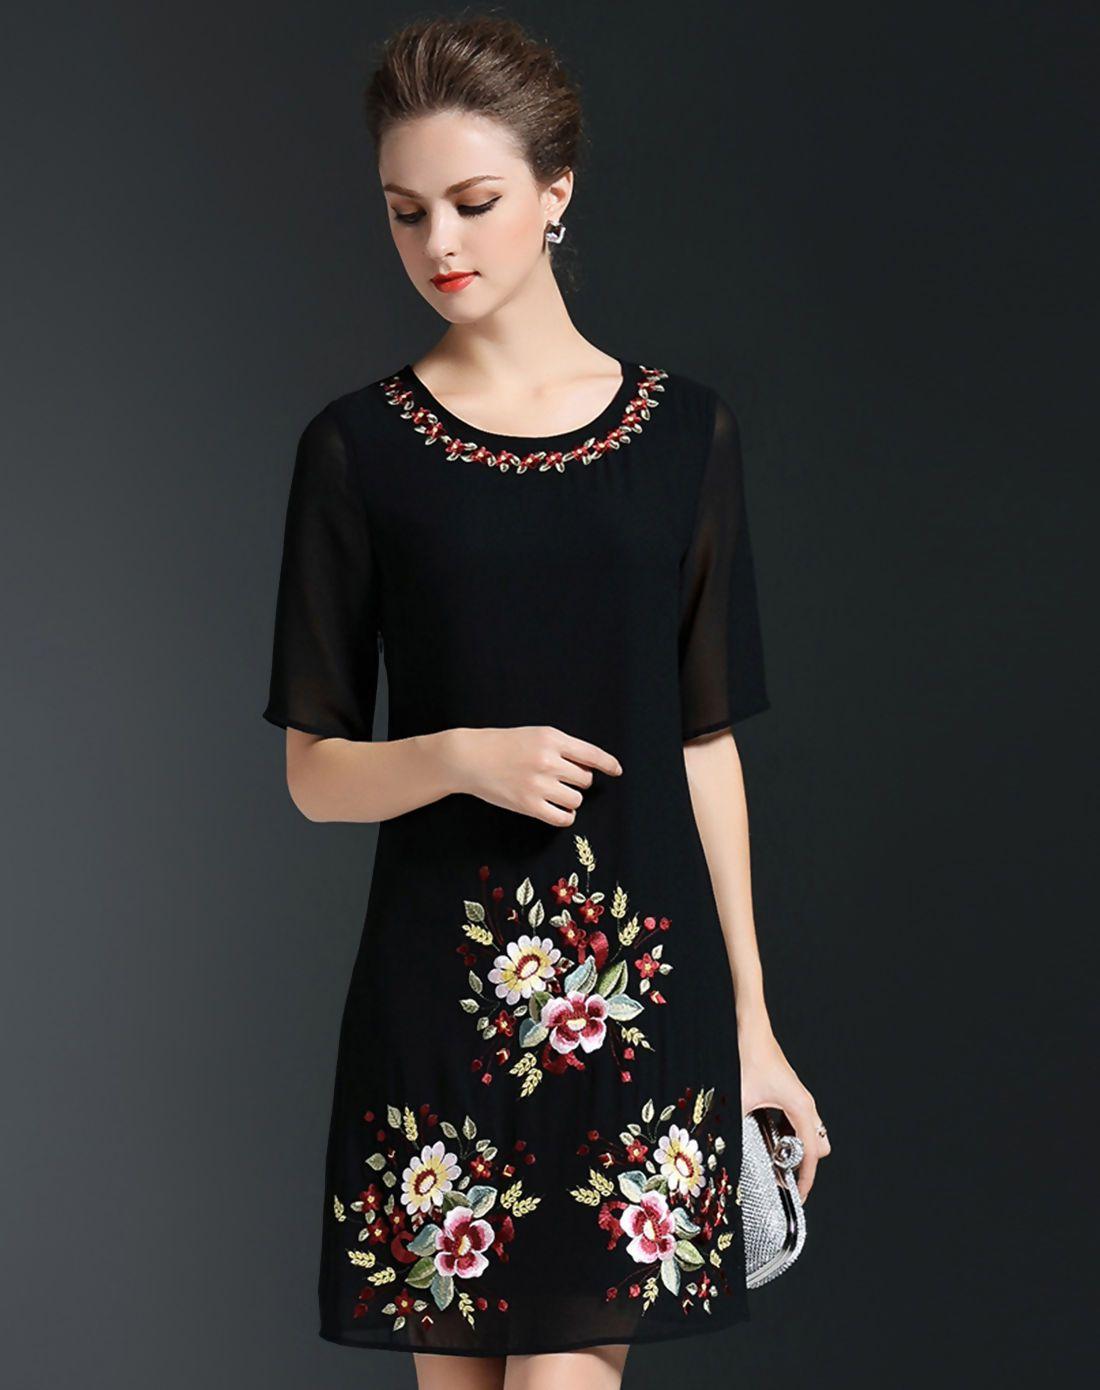 Adorewe vipme aline dresses qeexi black floral embroidery aline